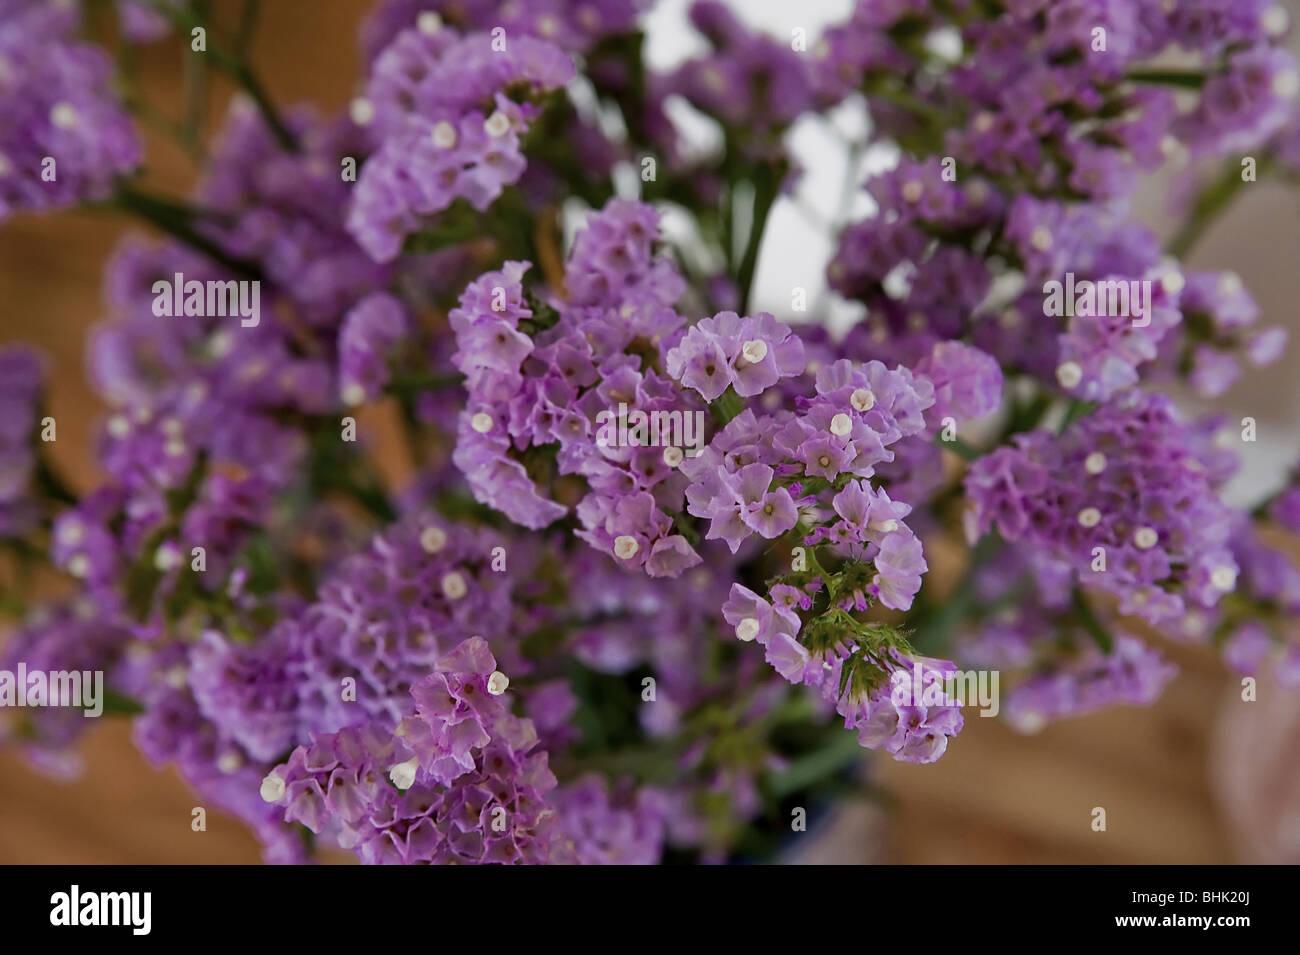 Purple flowers close up - Stock Image